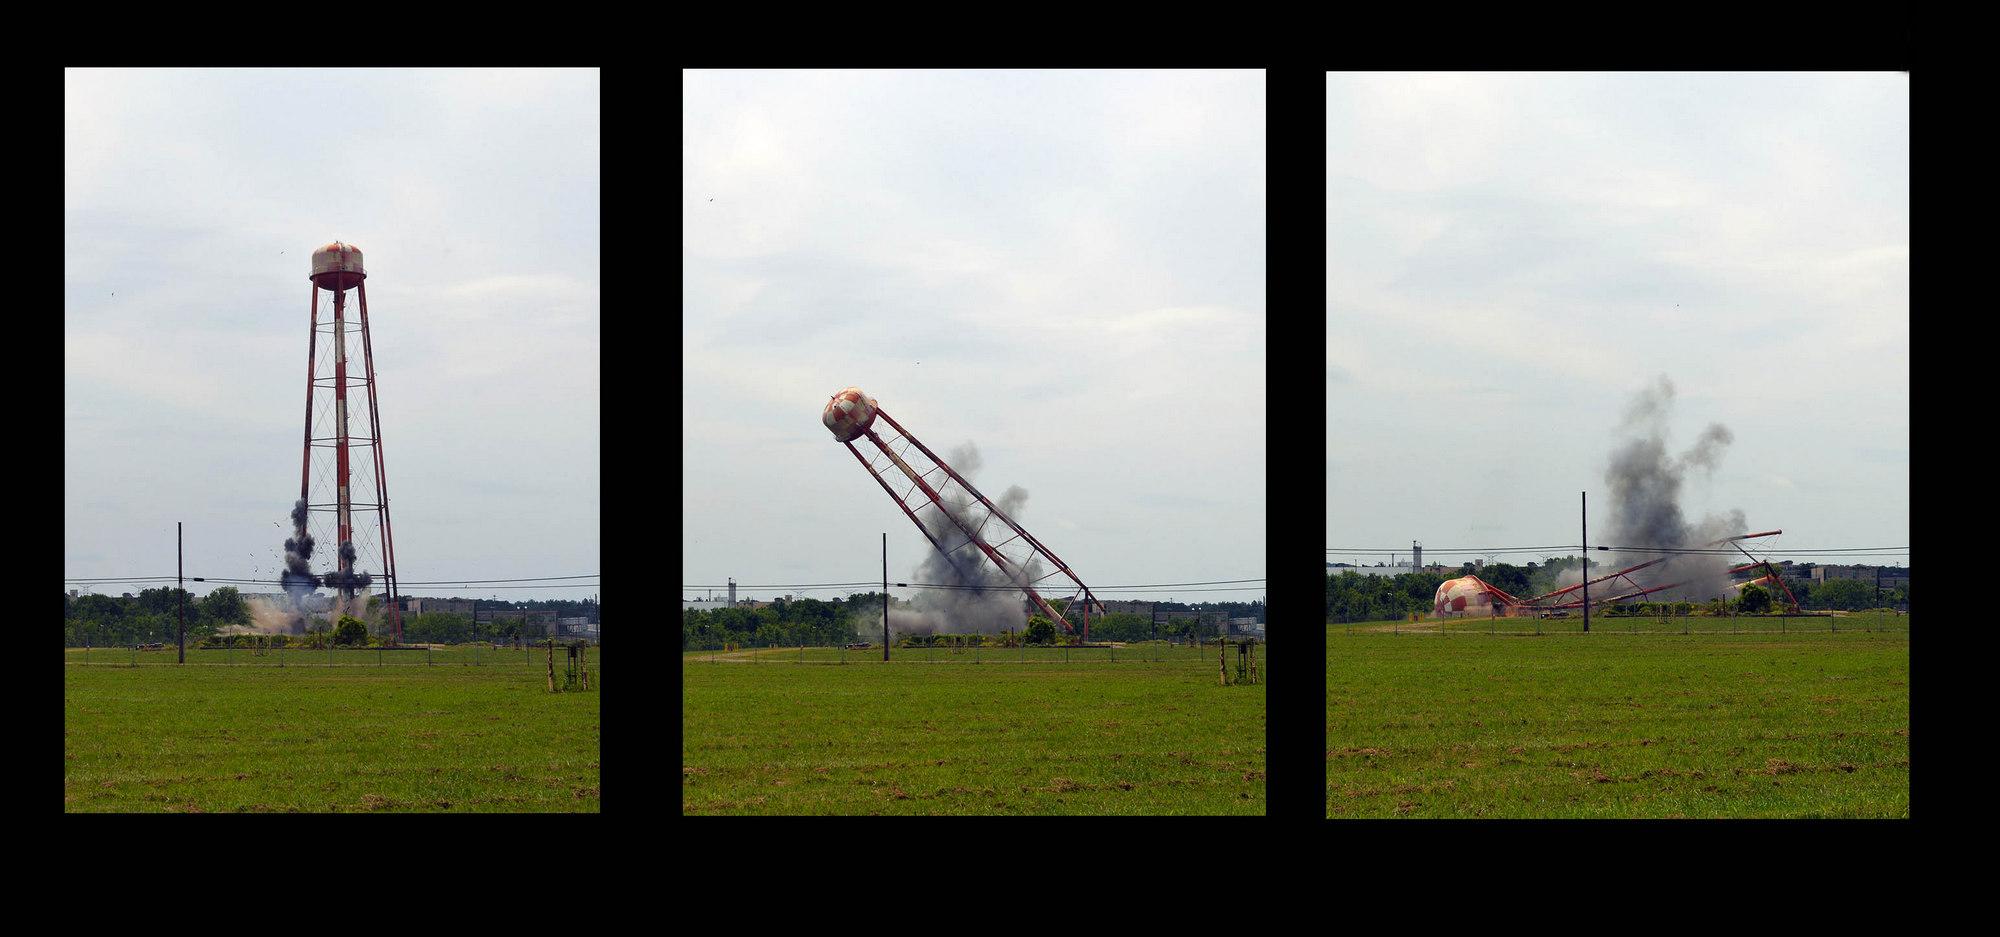 Oak Ridge Water Tower Demolition : Down goes the tower at k atomic city underground